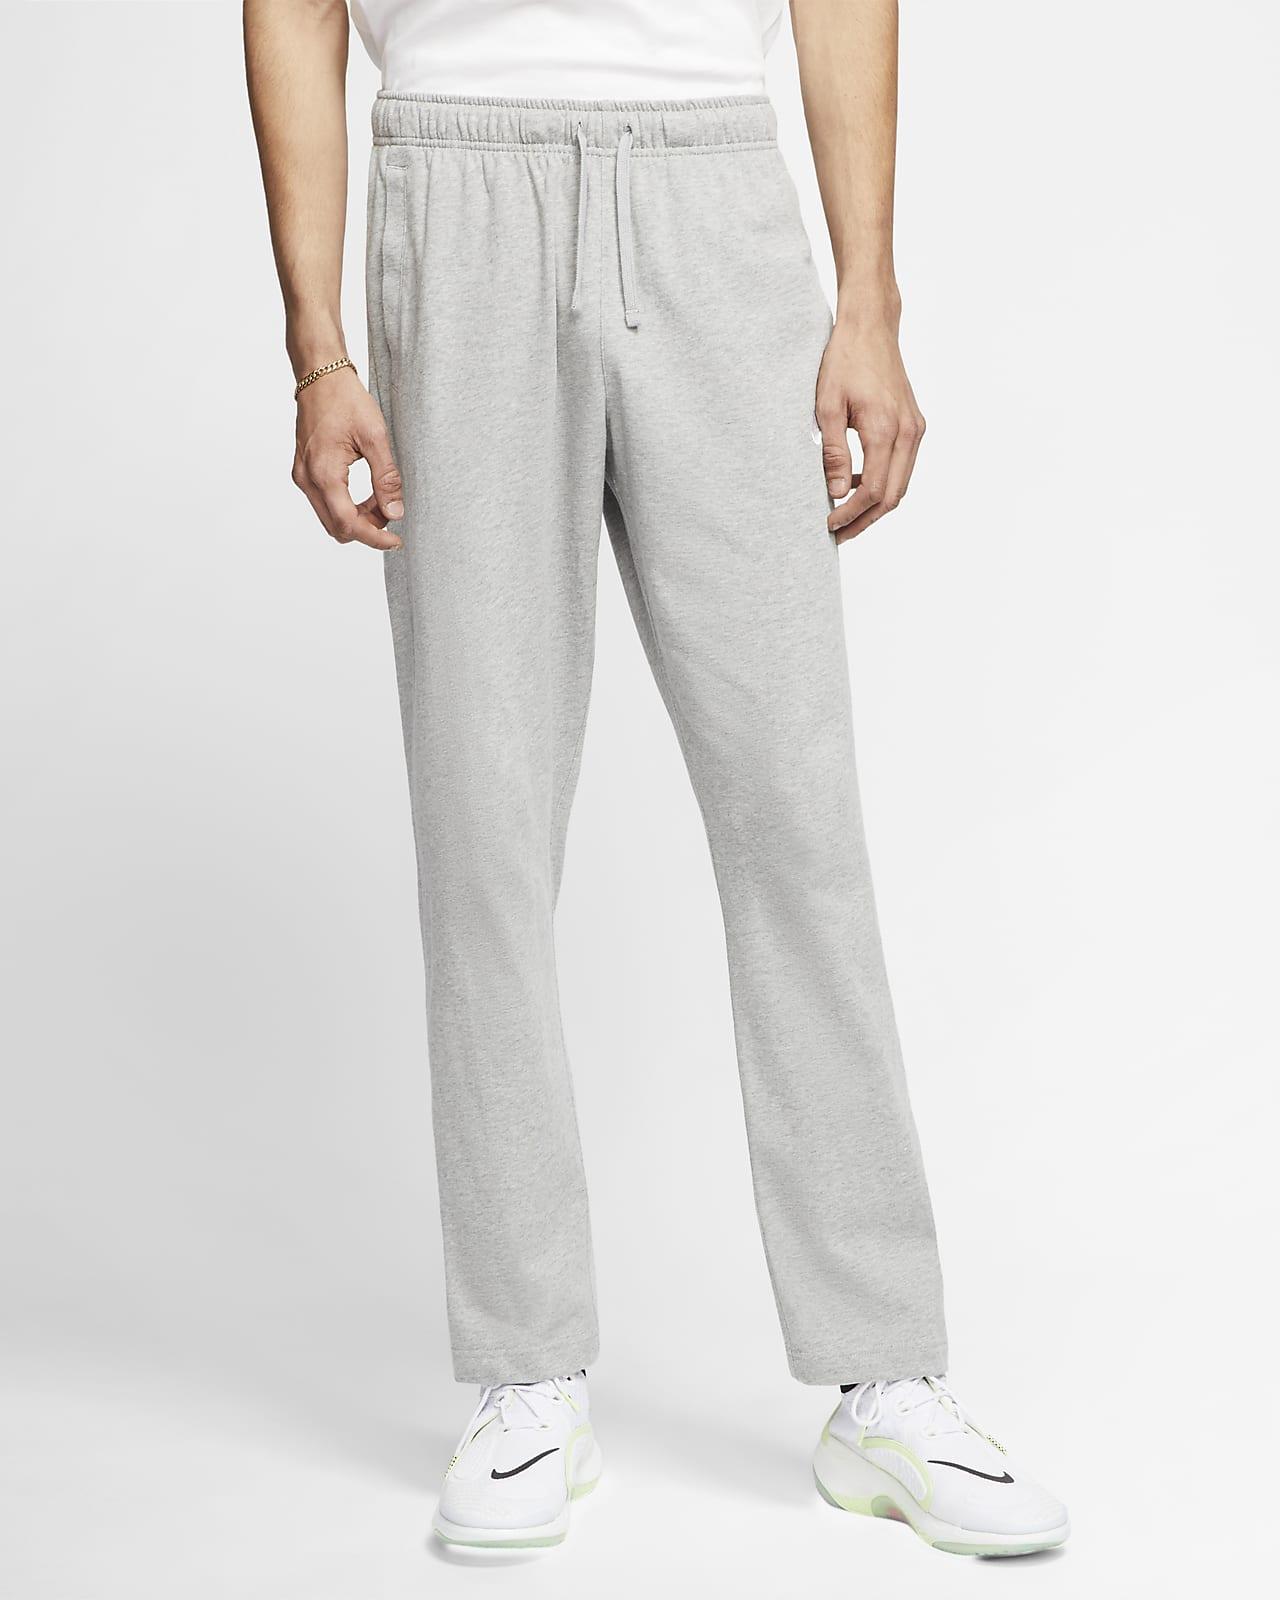 Nike Sportswear Club Fleece 男子针织长裤